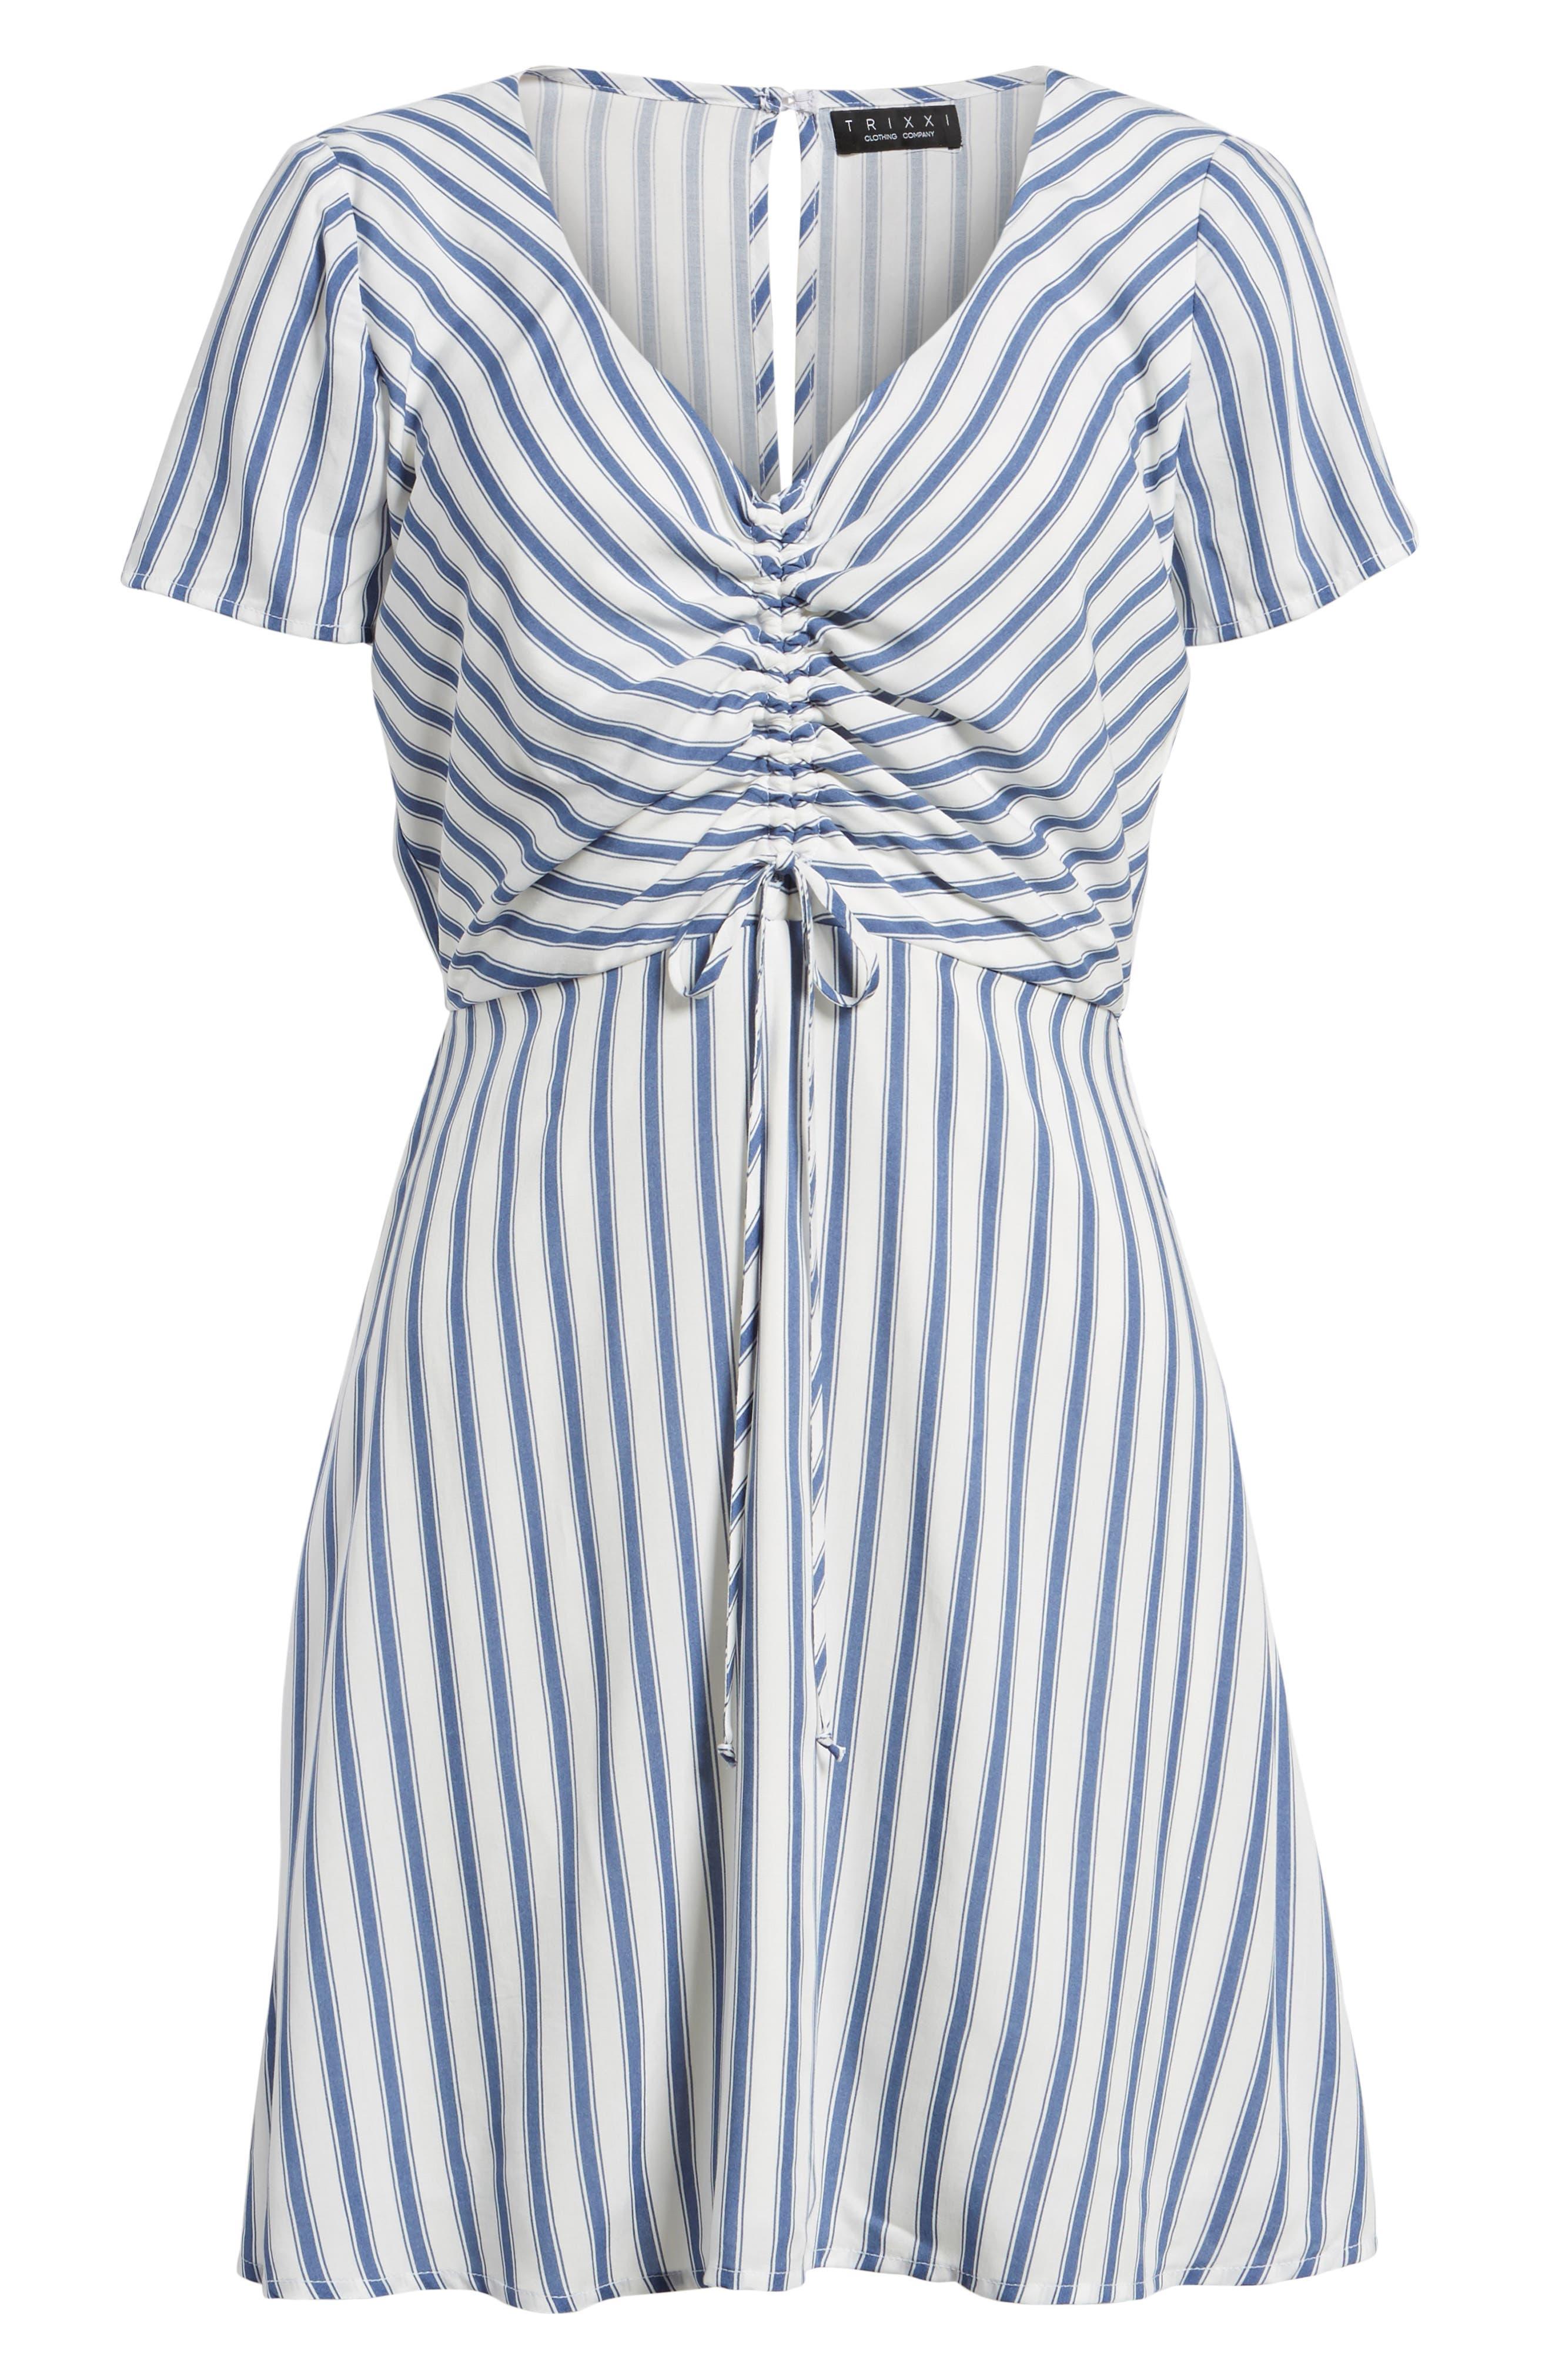 Cinch Front Minidress,                             Alternate thumbnail 6, color,                             Blue/ White Stripe